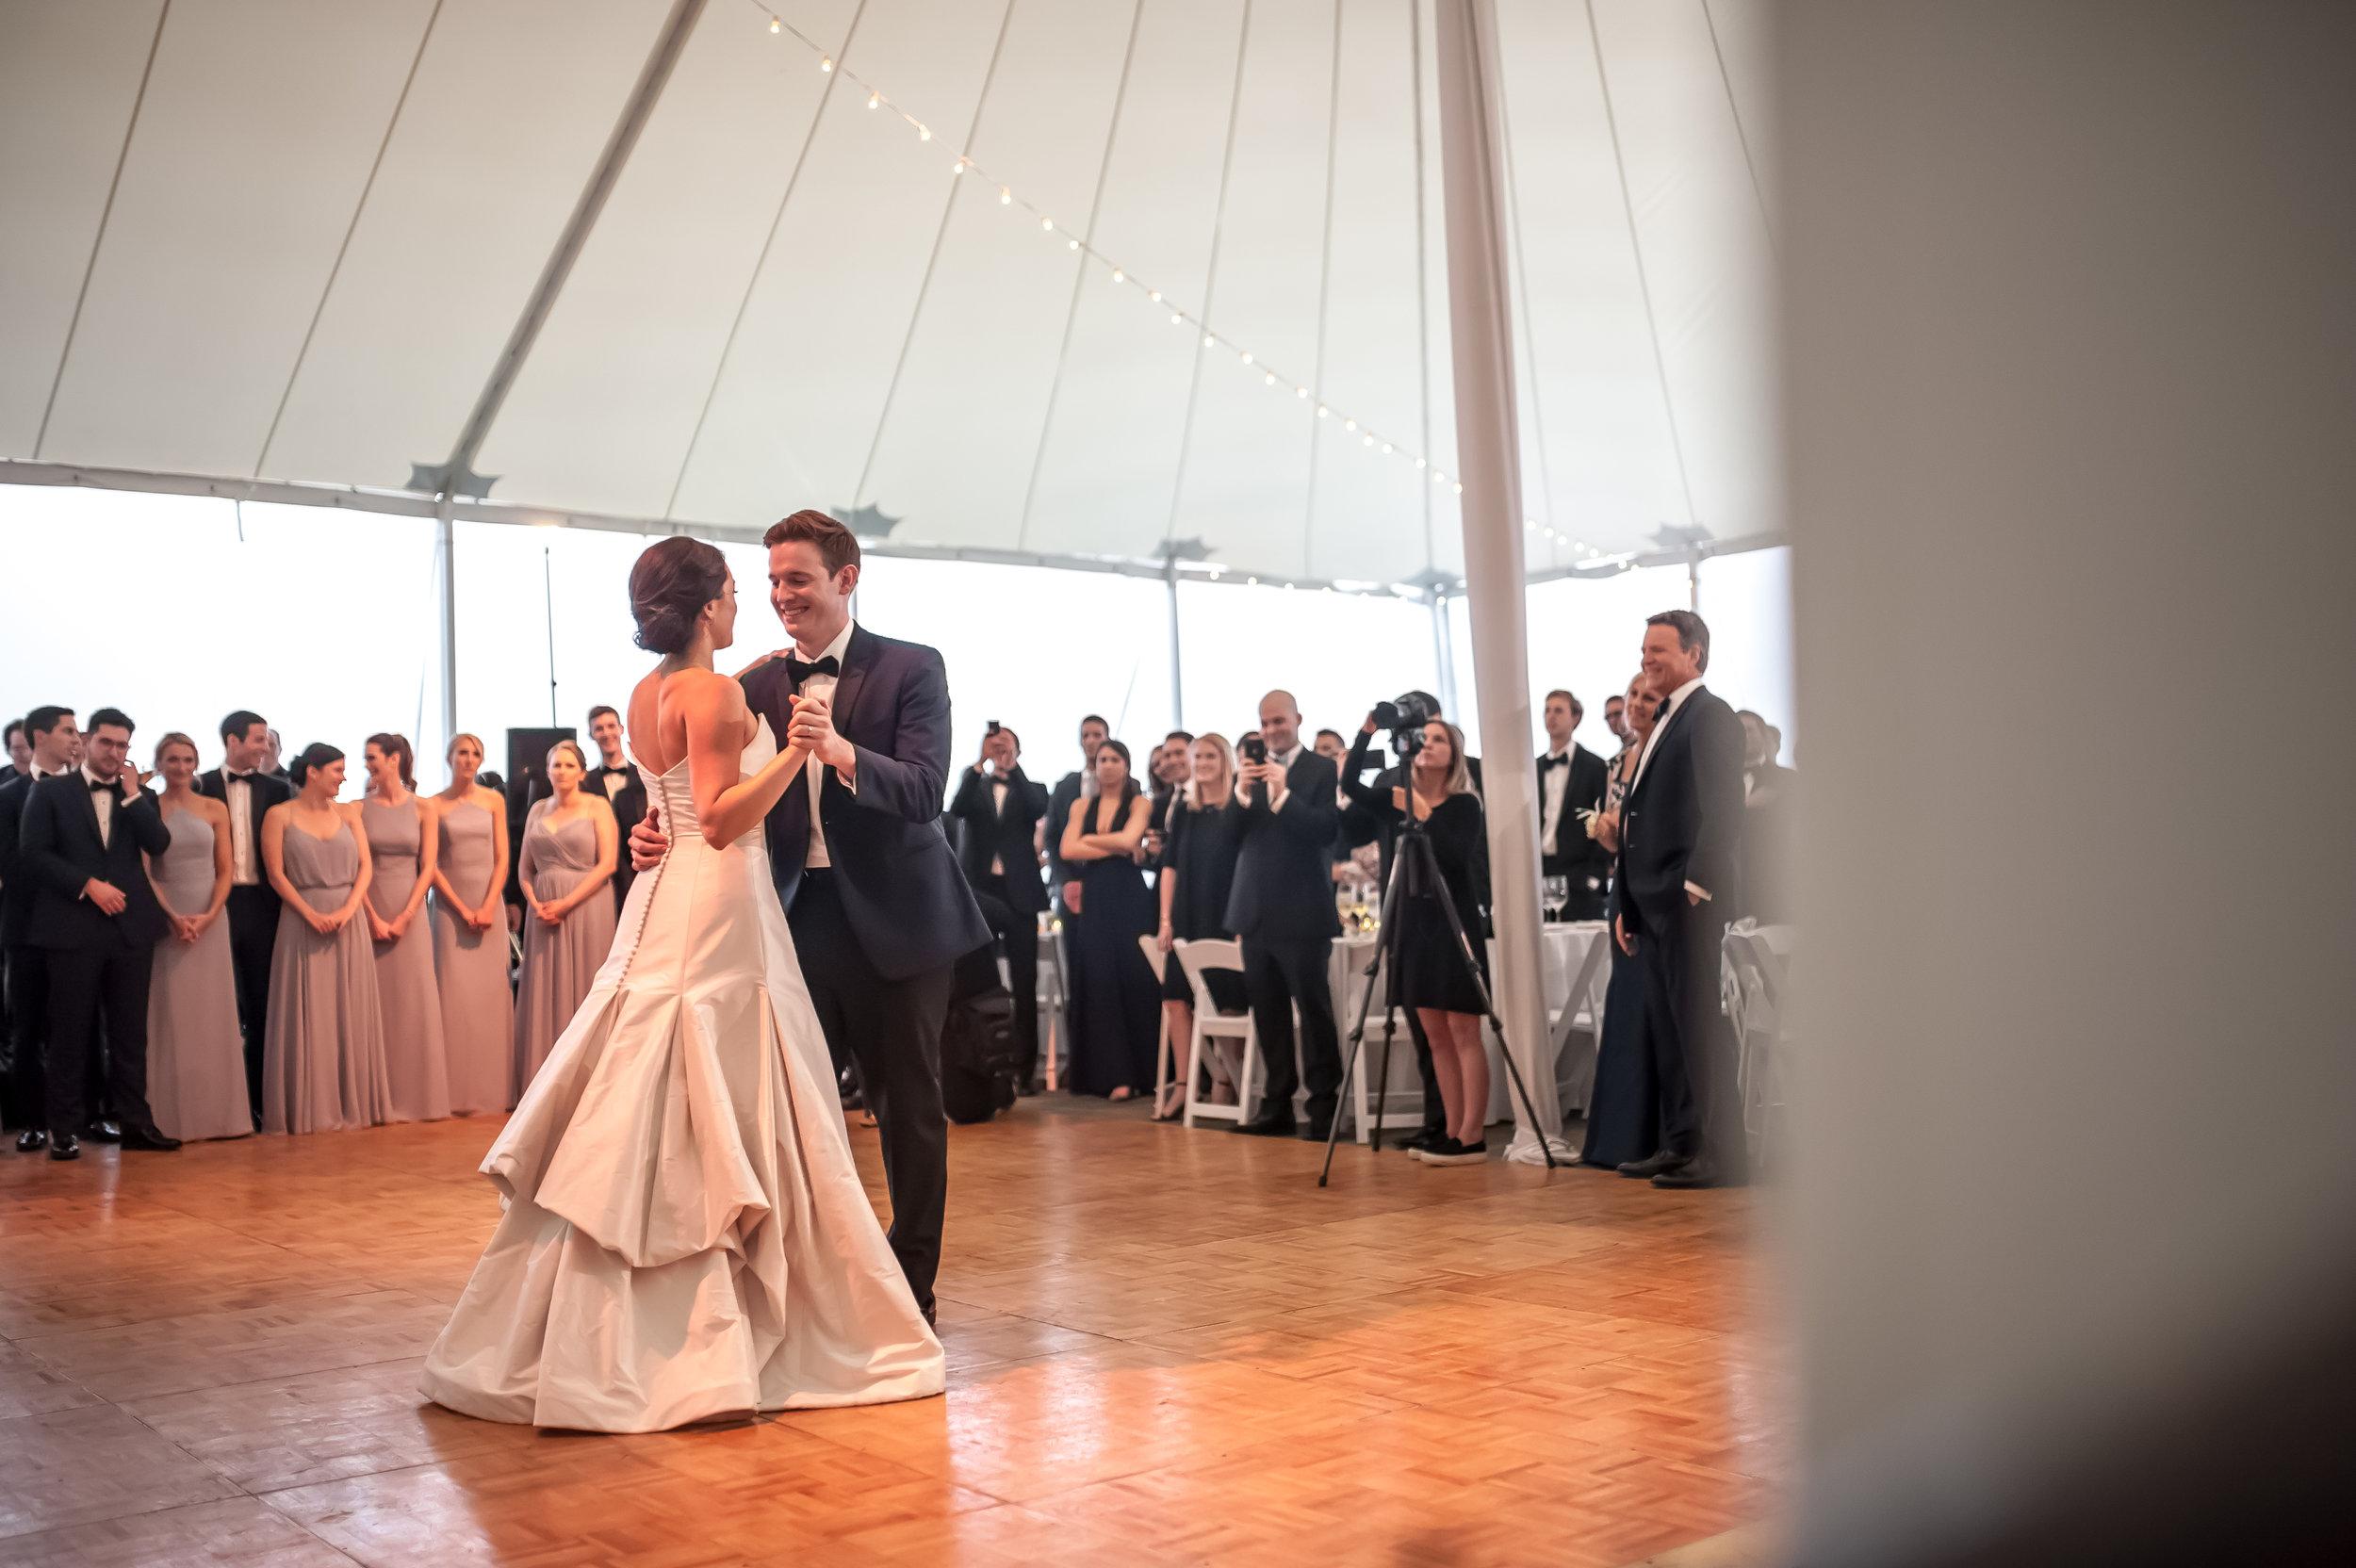 Jeremie_Barlow_Photography_Steffen_Sudyam_wedding_2018-892.jpg